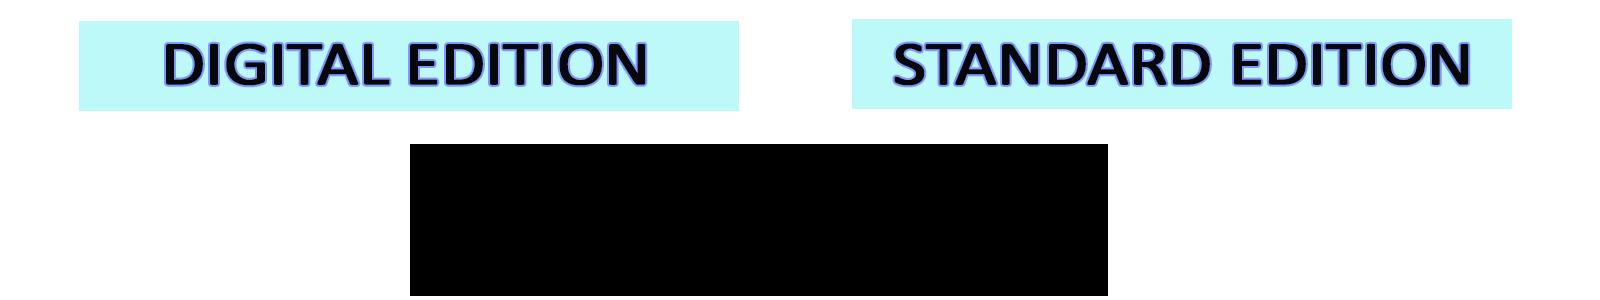 playstation 5 Standard